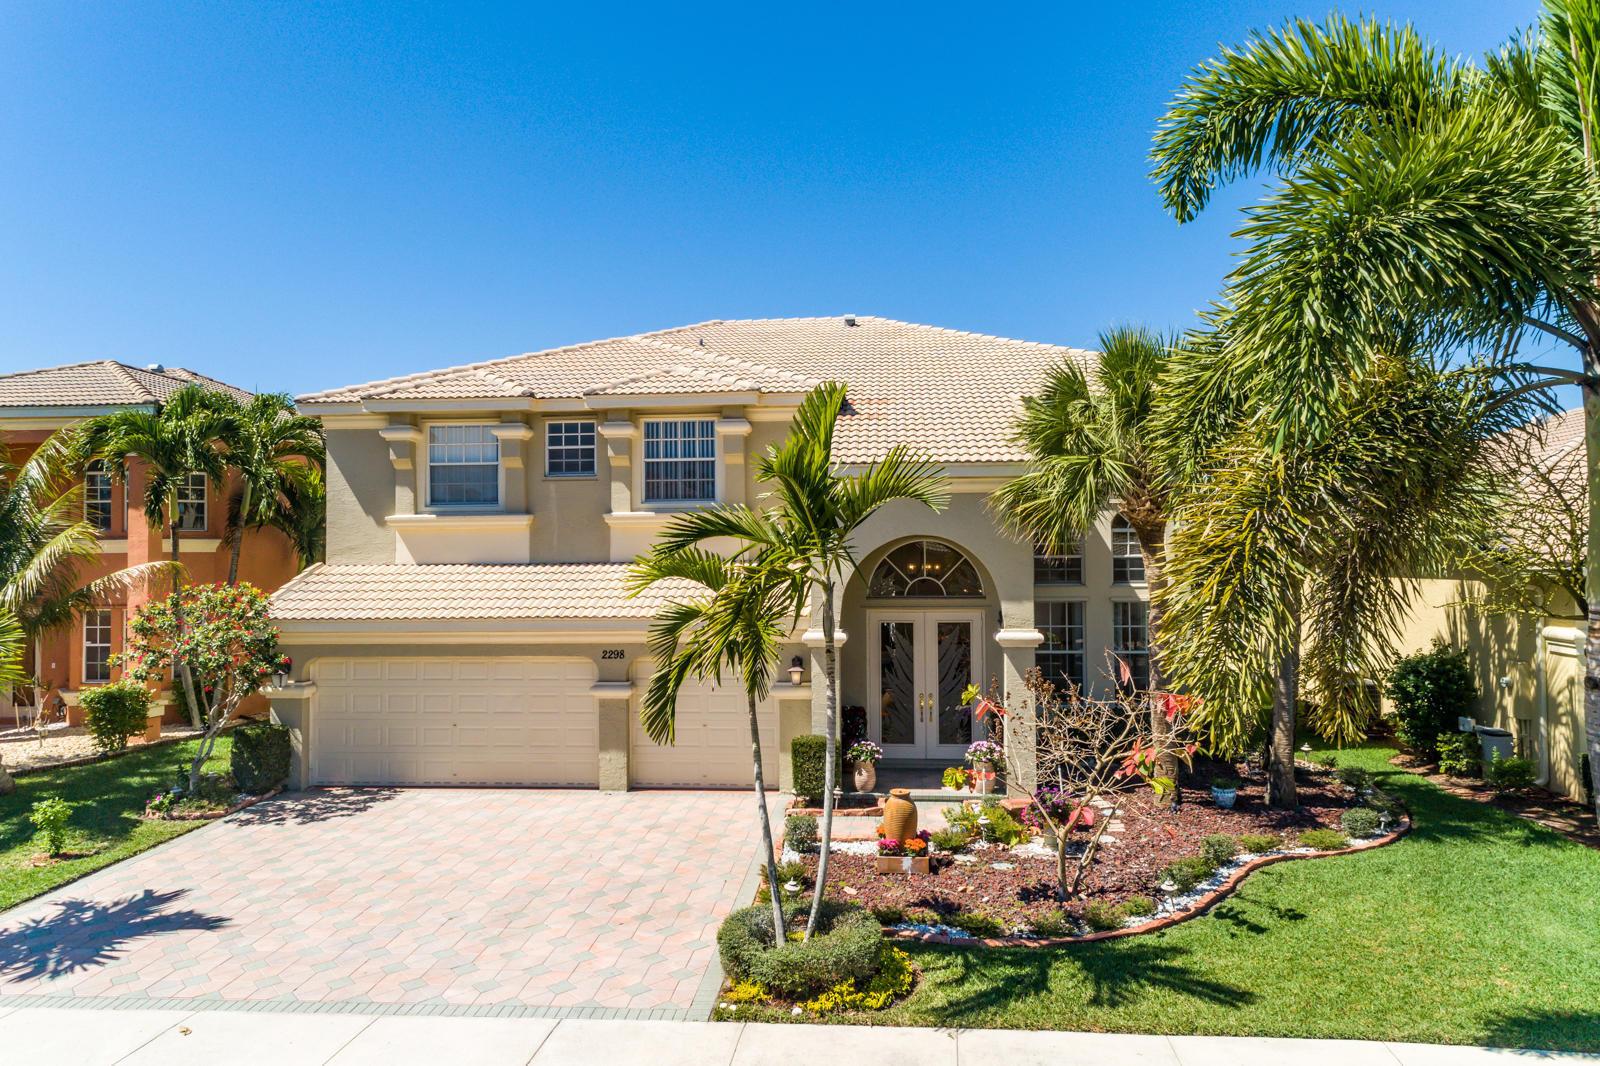 2298 Ridgewood Circle, Royal Palm Beach, Florida